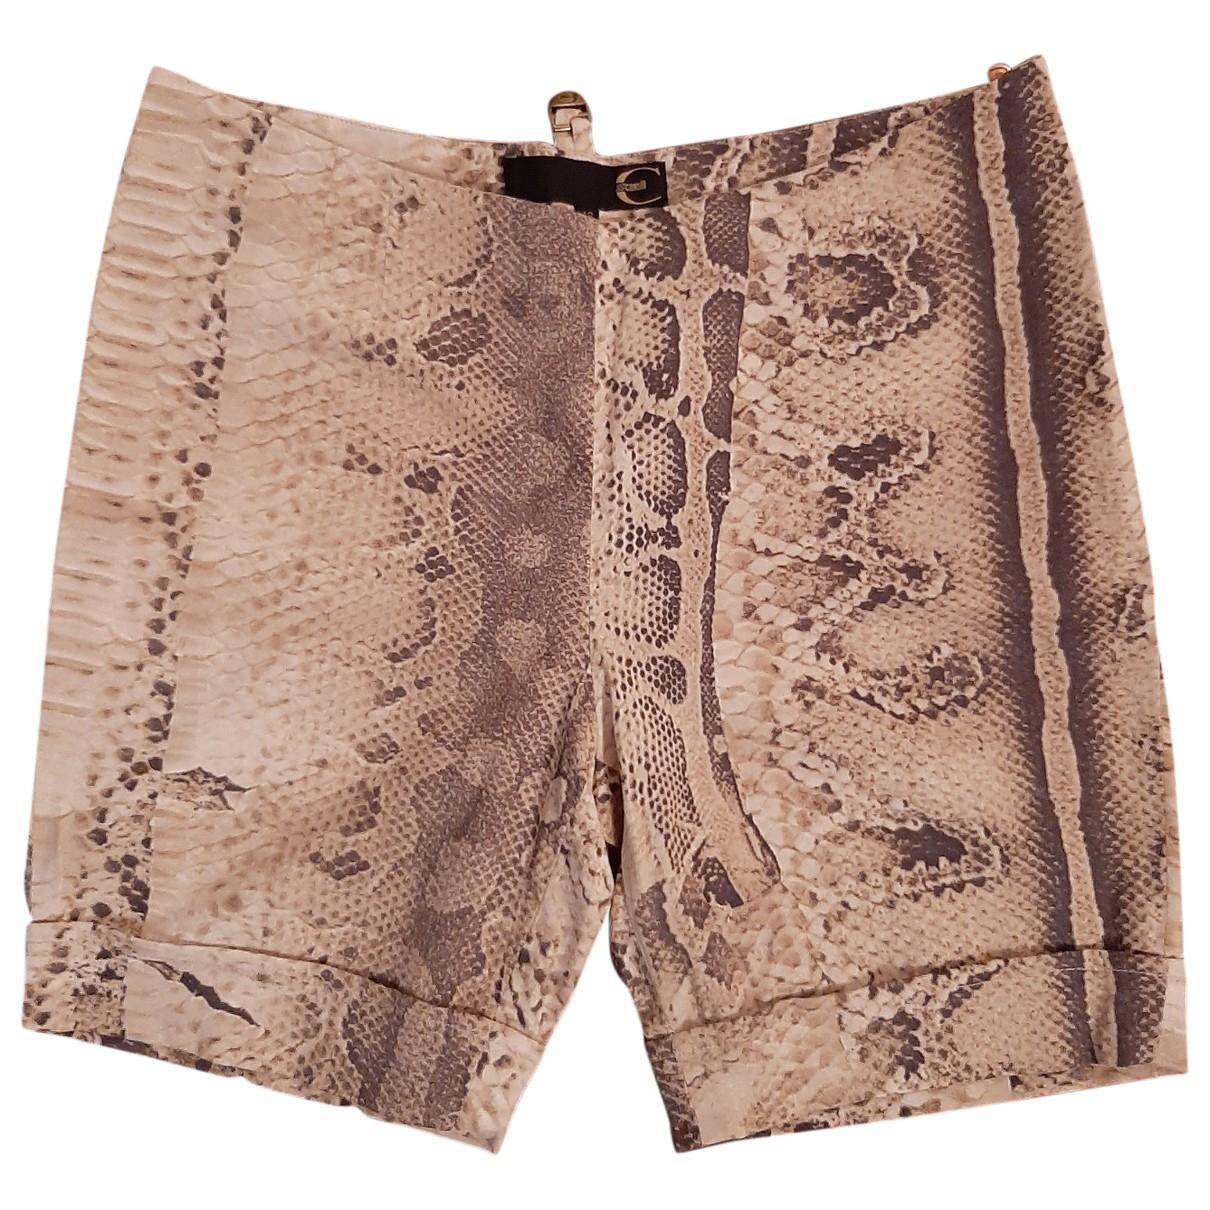 Just Cavalli \N Beige Shorts for Women 46 IT